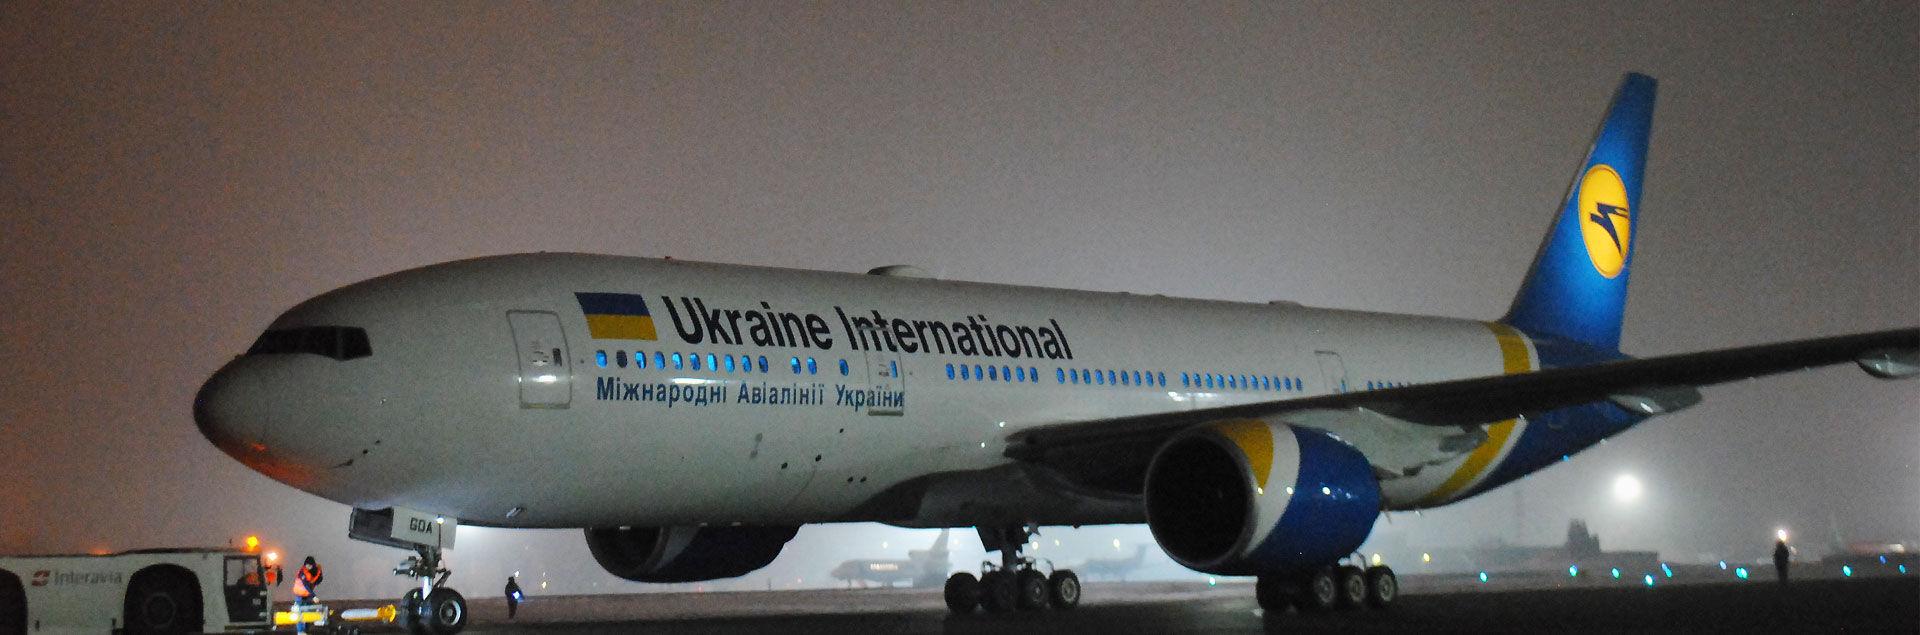 UIA received the first Boeing 777 aircraft – Ukraine International ...